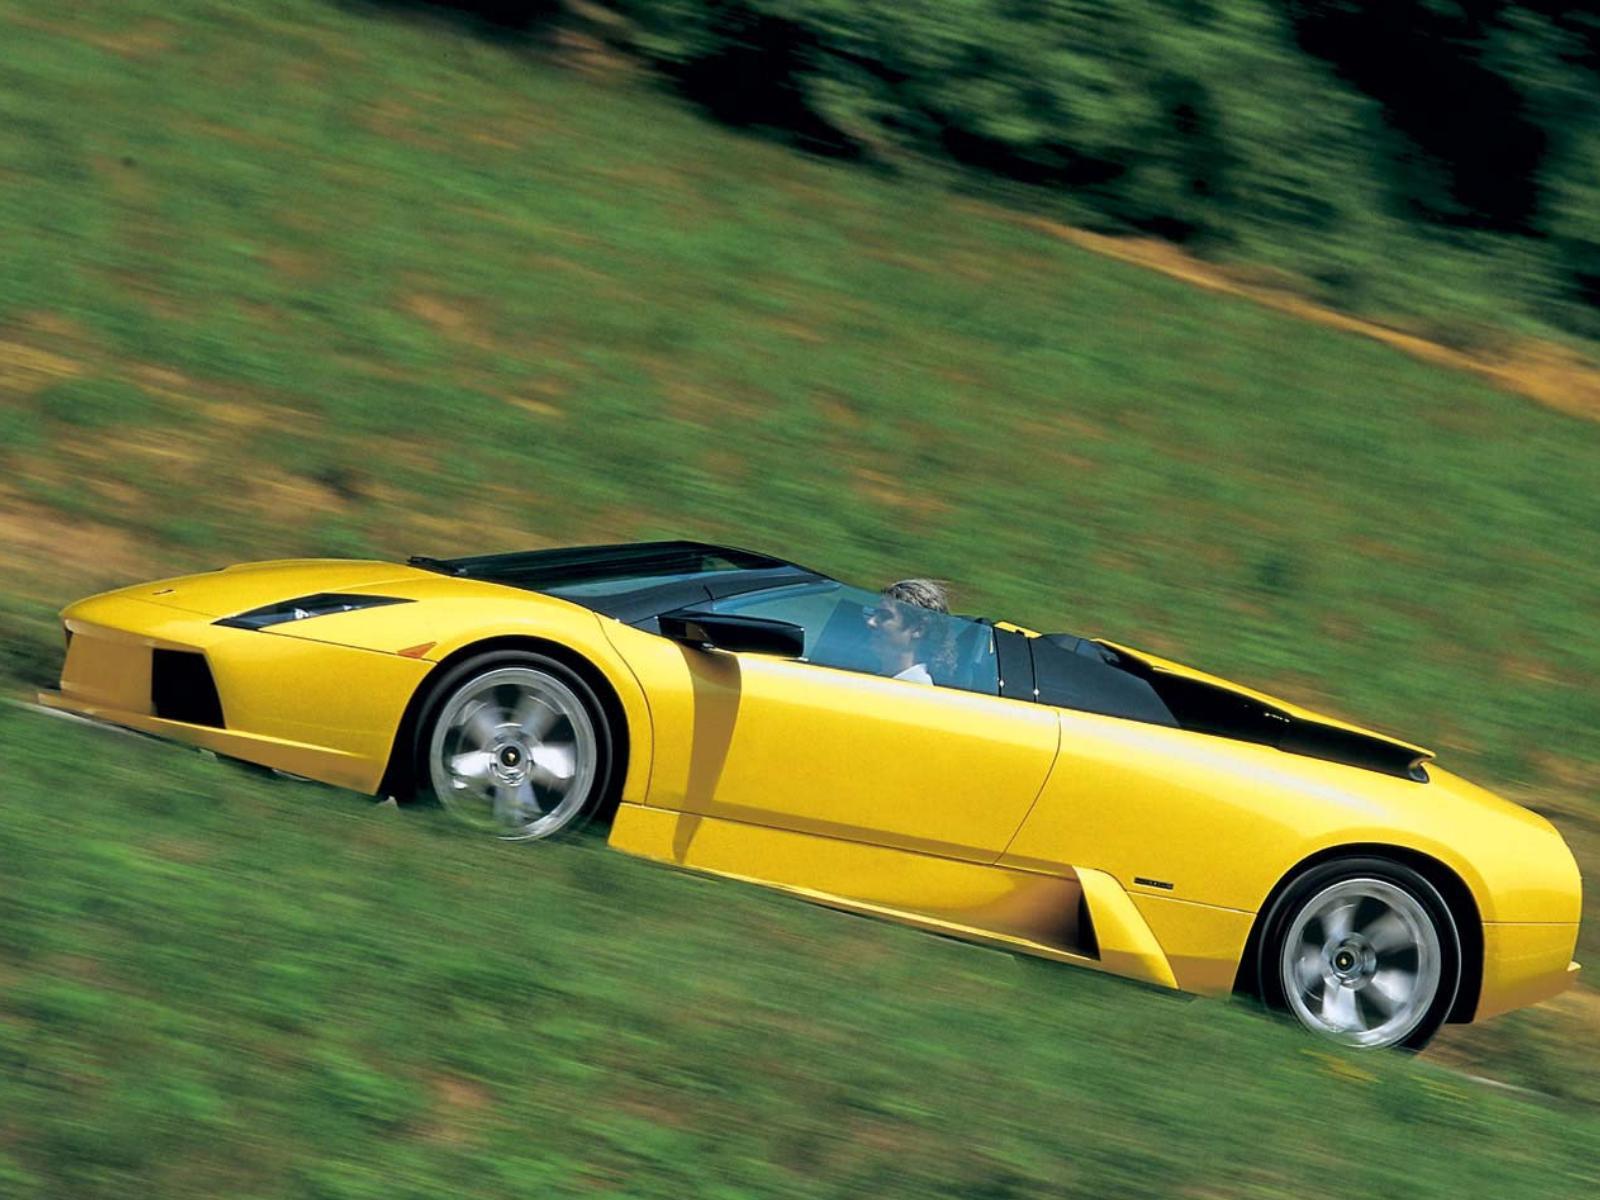 Lamborghini Murcielago Roadster Picture 15931 Lamborghini Photo